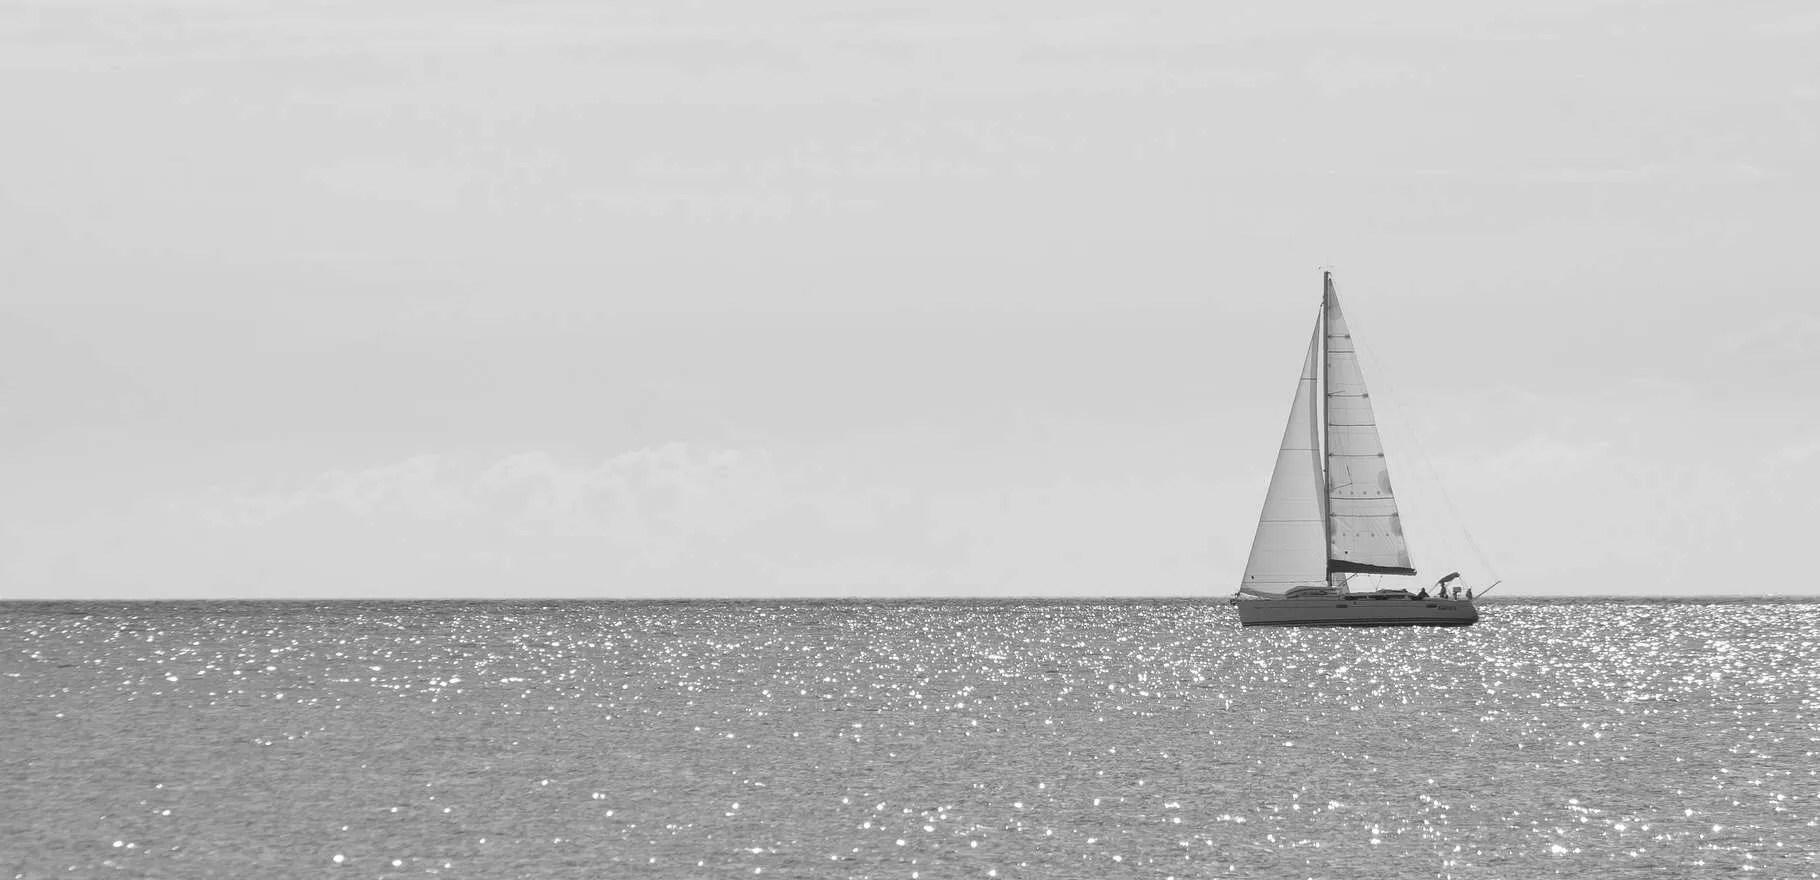 Boat Insurance Oyer Macoviak and Associates